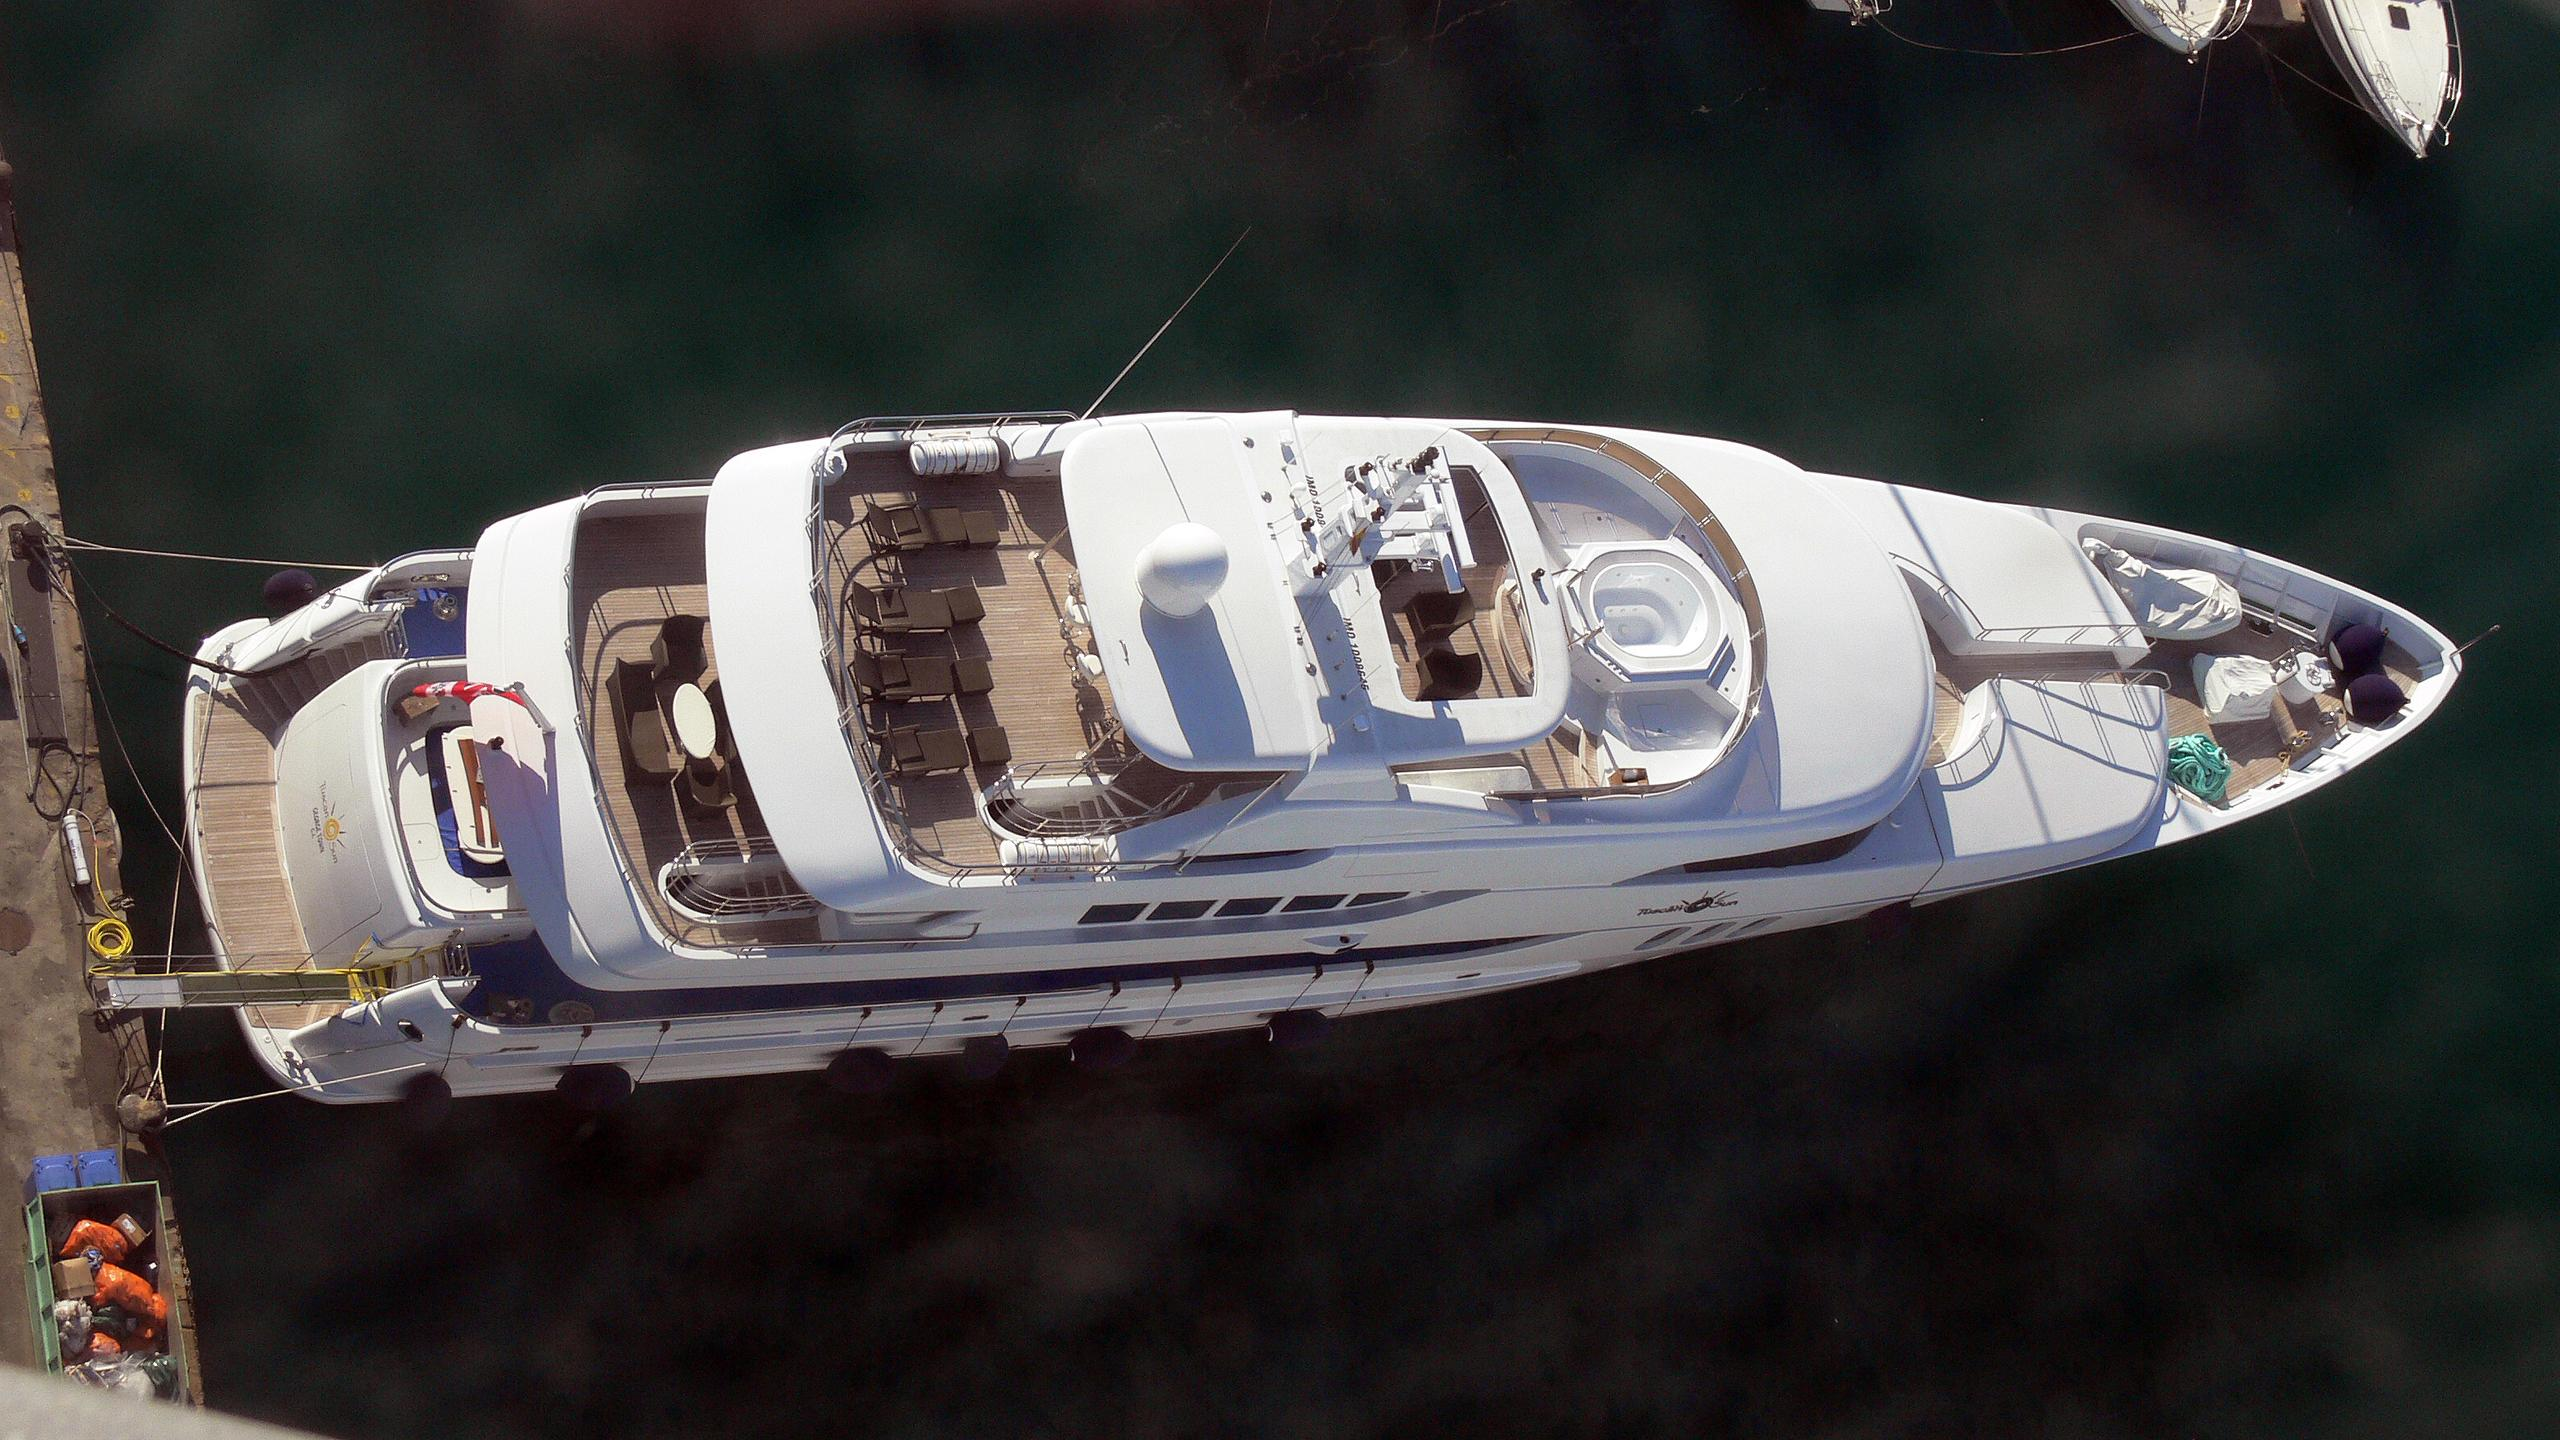 coco-viente-tuscan-sun-motor-yacht-izar-2006-45m-aerial